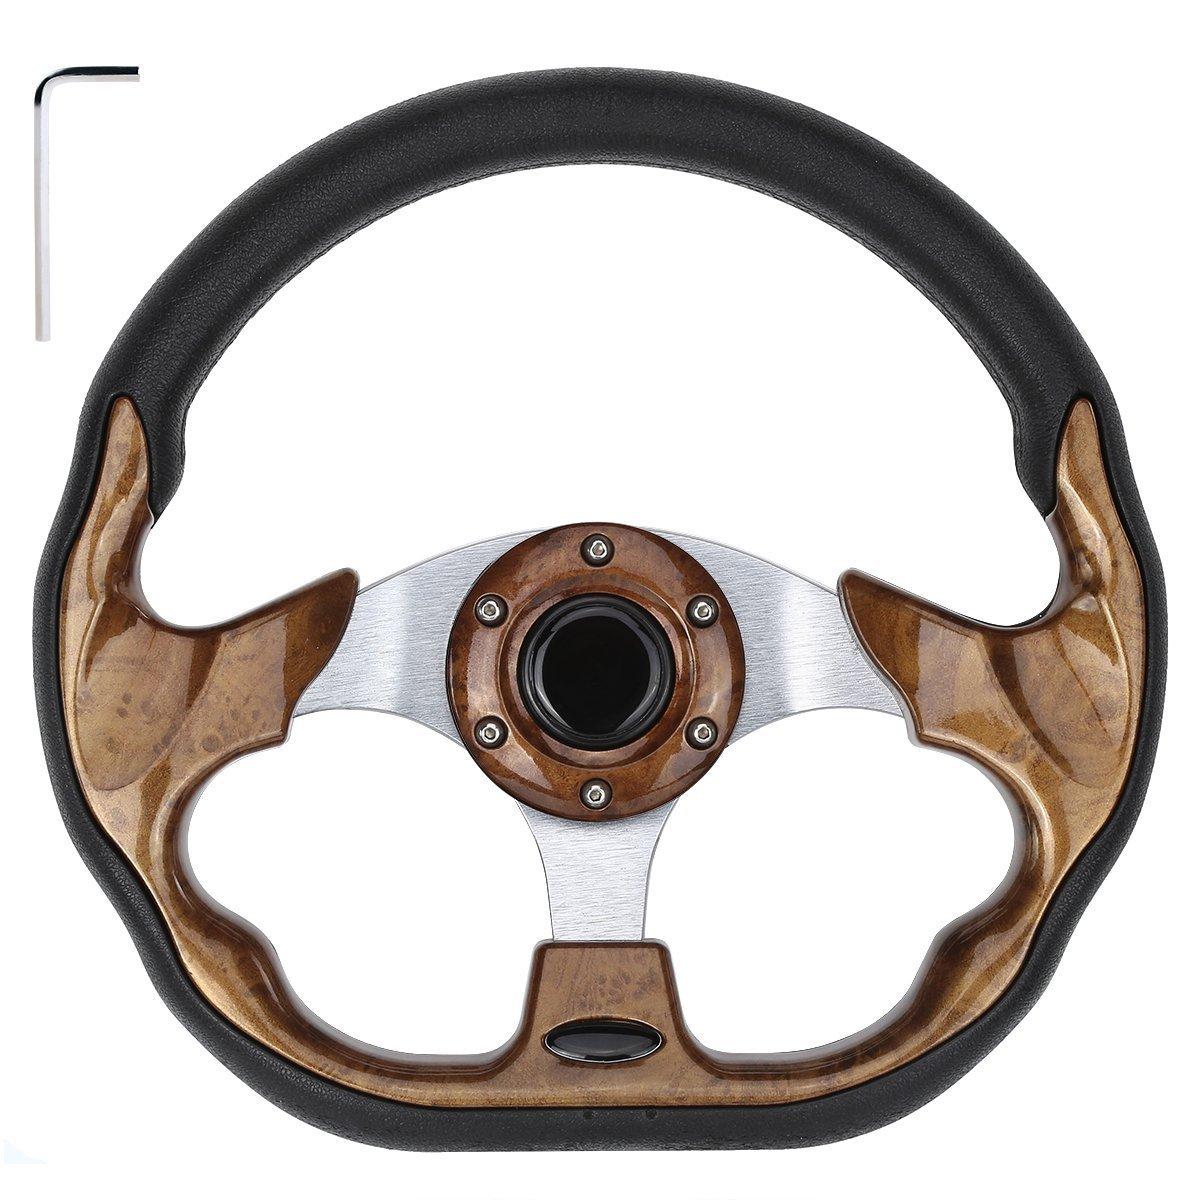 10L0L Golf Cart Steering Wheel, Generic of Most Golf cart EZGO Club Car Yamaha (stlye2 Wood)